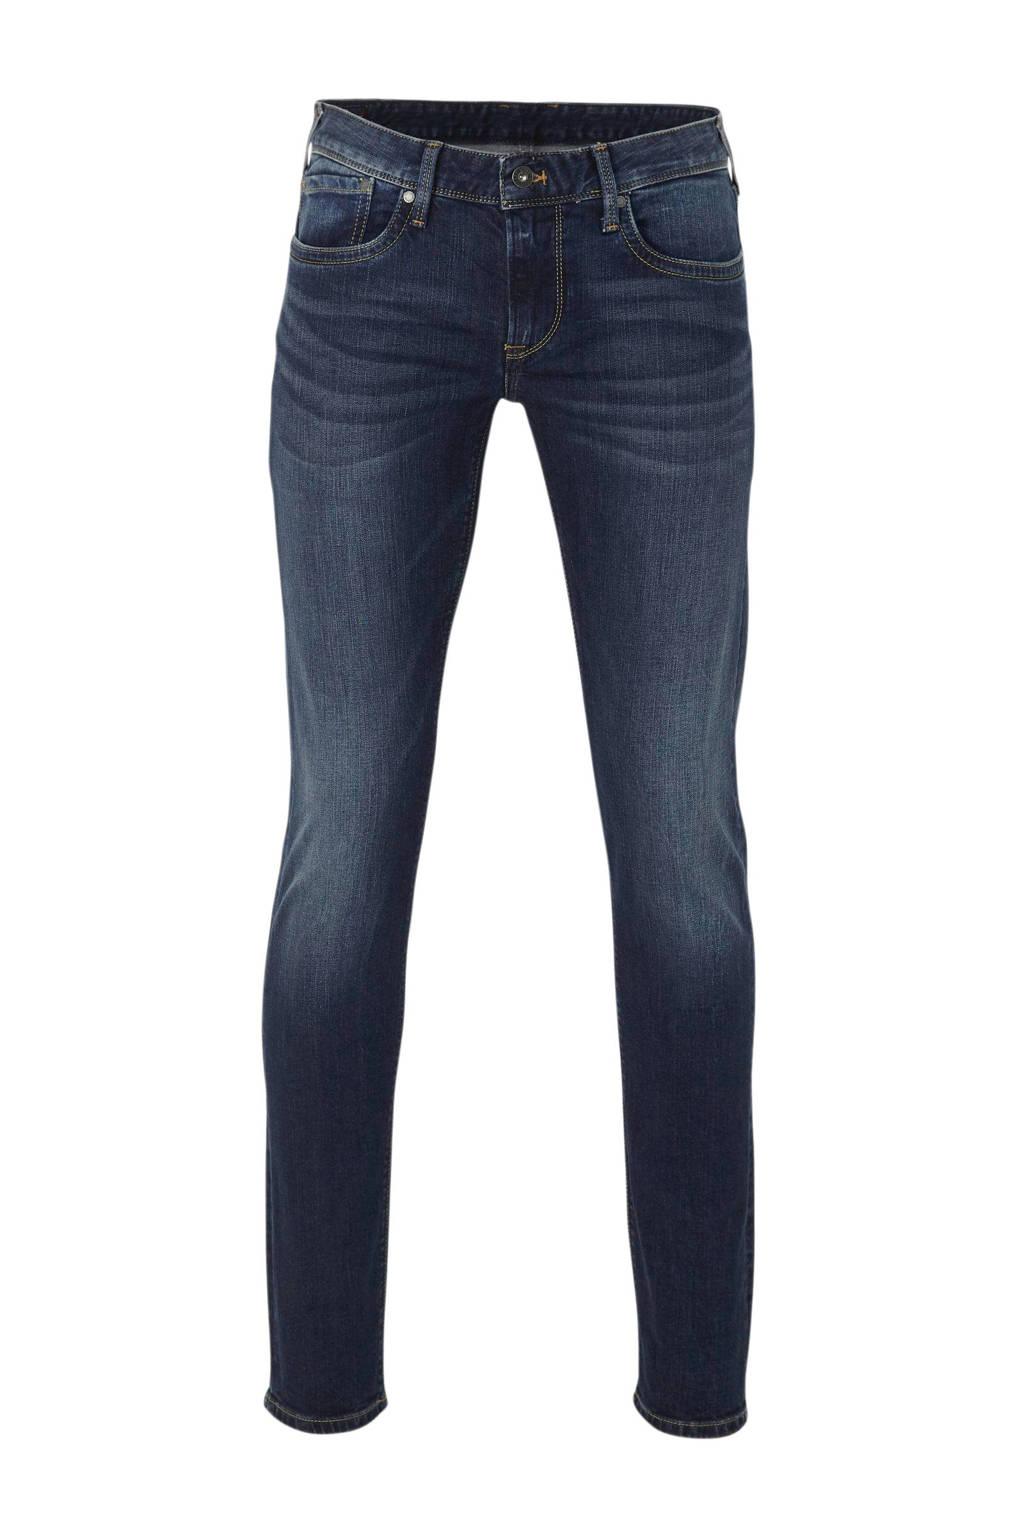 Pepe Jeans slim fit jeans Hatch denim, Blauw